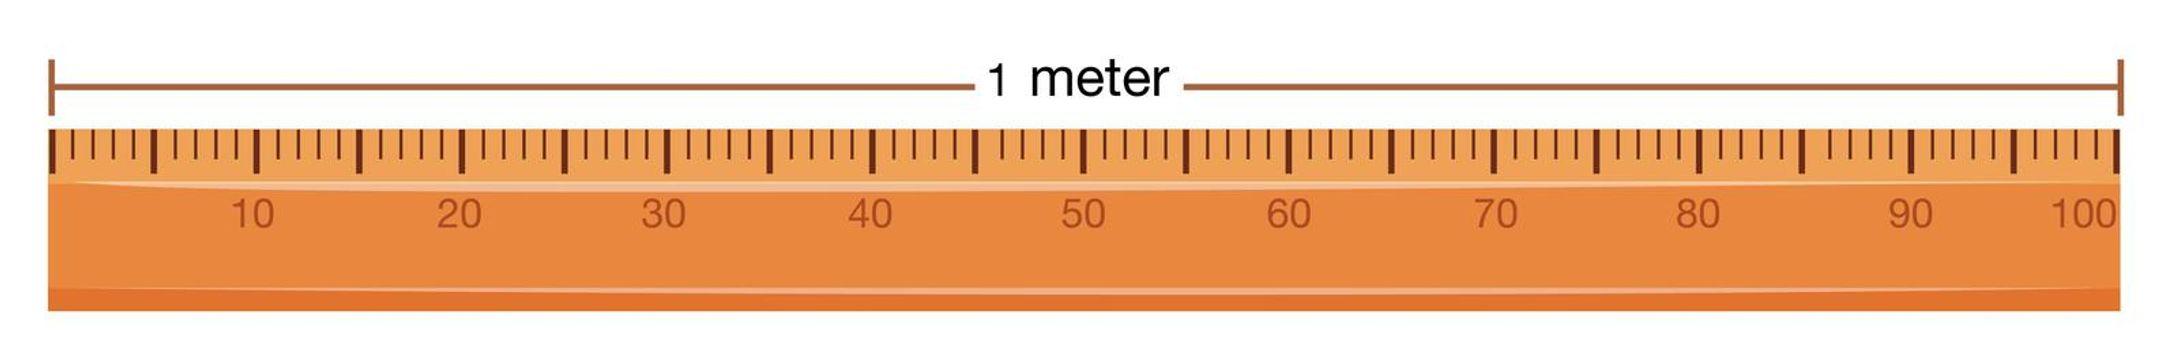 Wooden ruler with measurement in meter illustration